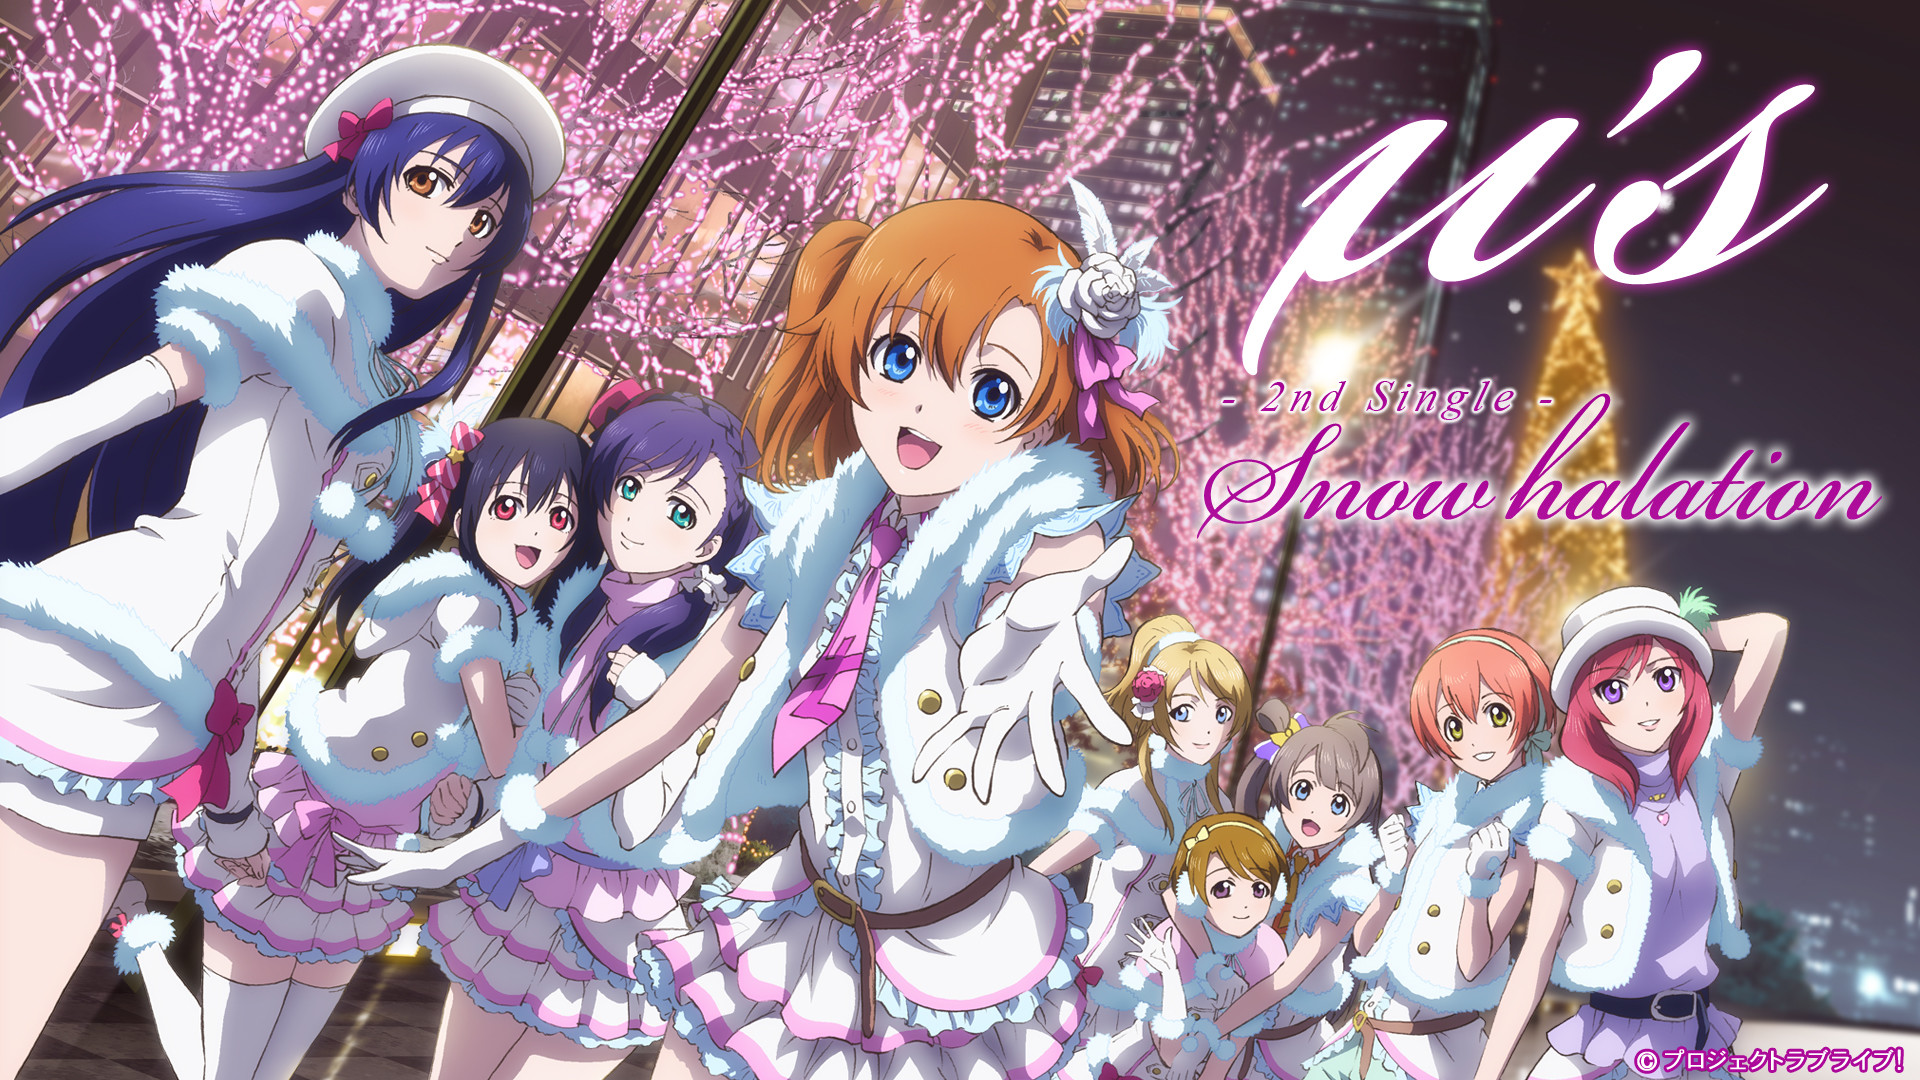 Desktop live wallpapers is one of the best apps offering animated wallpapers. Anime Live Wallpapers for Desktop (62+ images)